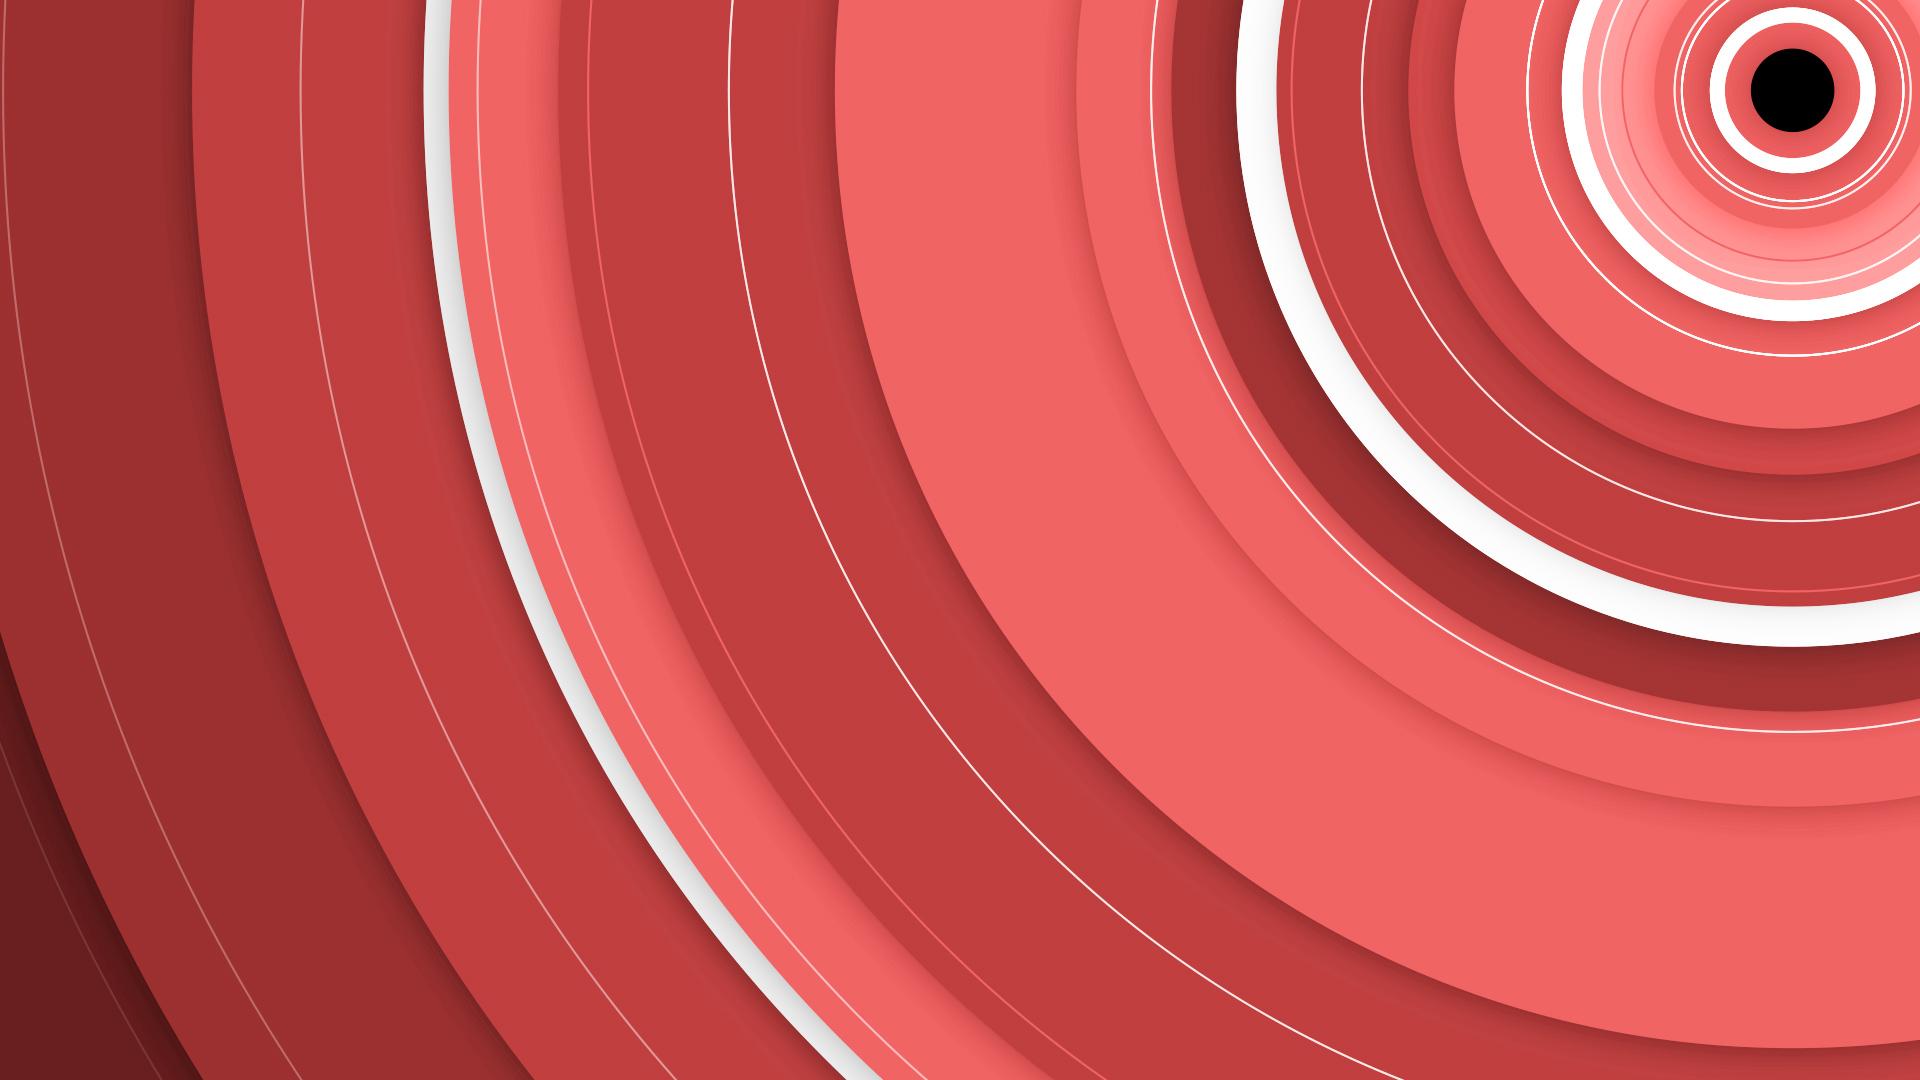 Crown Hd Wallpaper X1bg Circles Red Martin Crownover